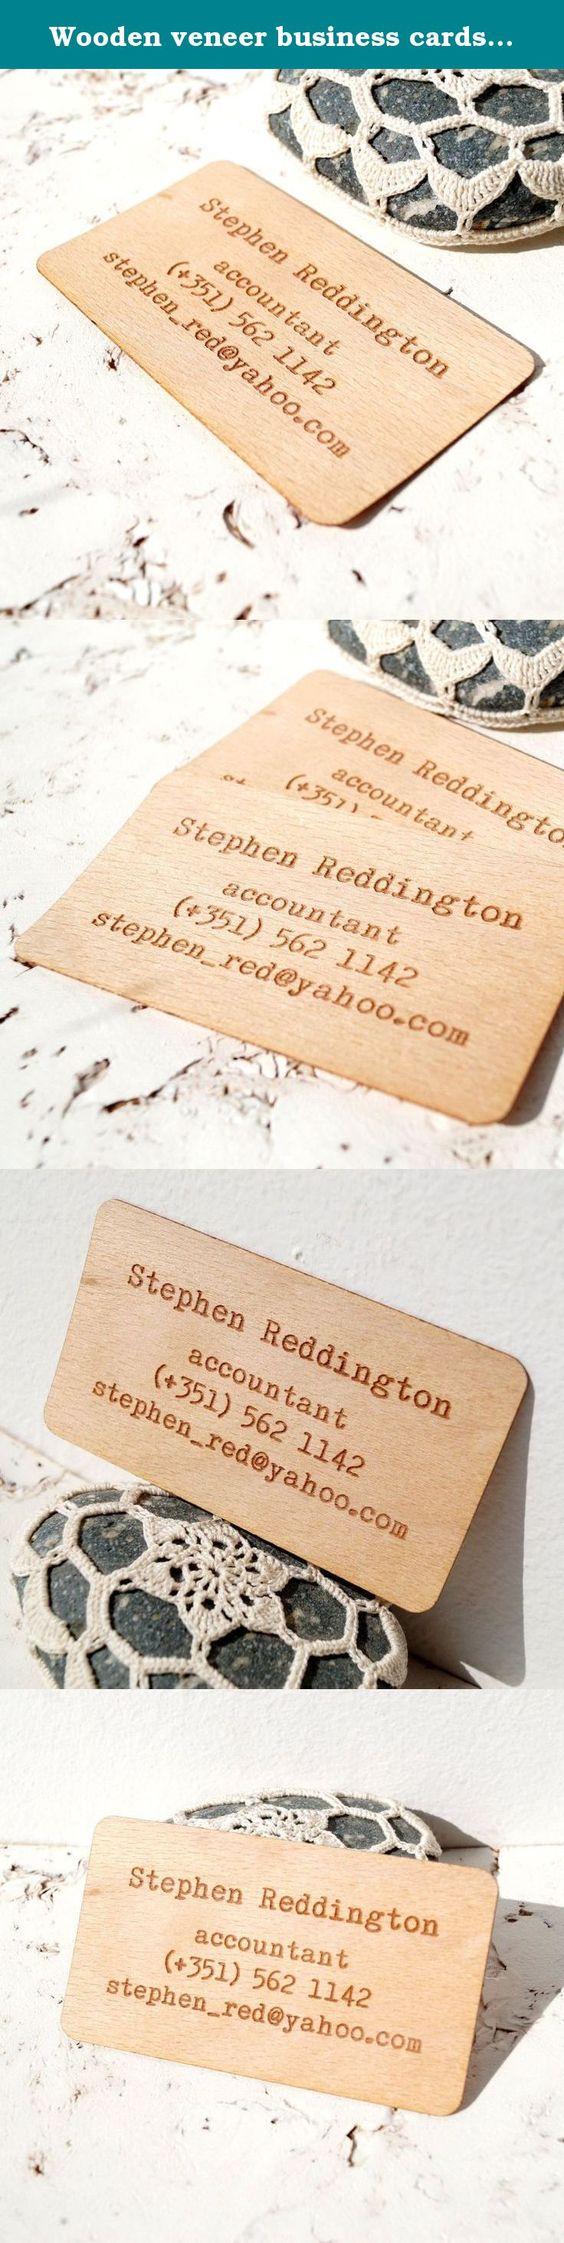 Wooden veneer business cards, engraved real wooden veneer business ...